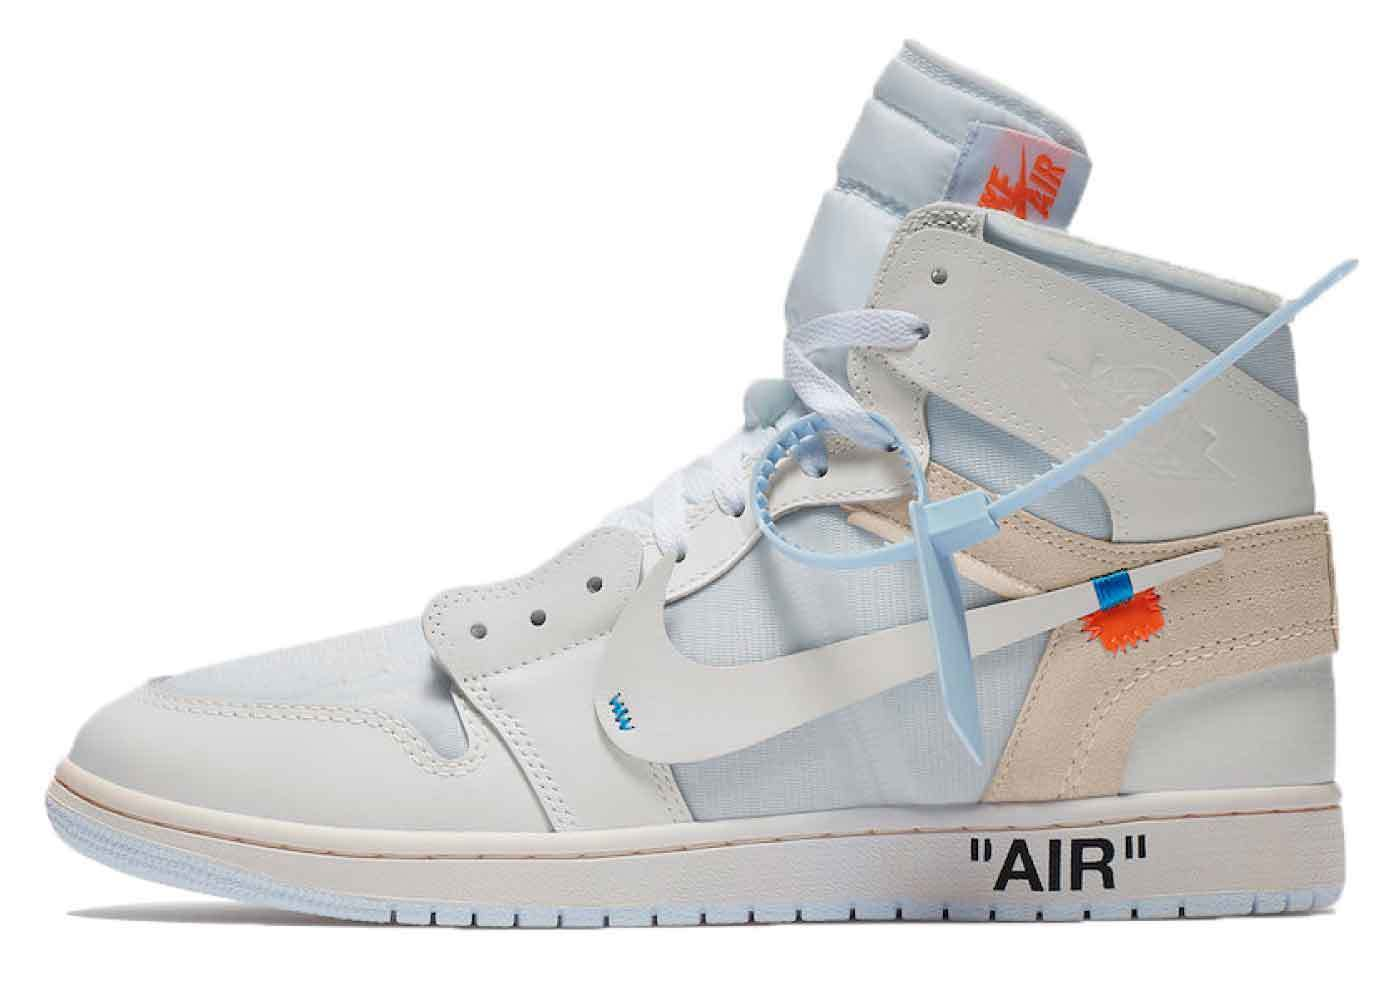 Off-White × Nike Air Jordan 1 Retro High NRG White (EU Exclusive)の写真